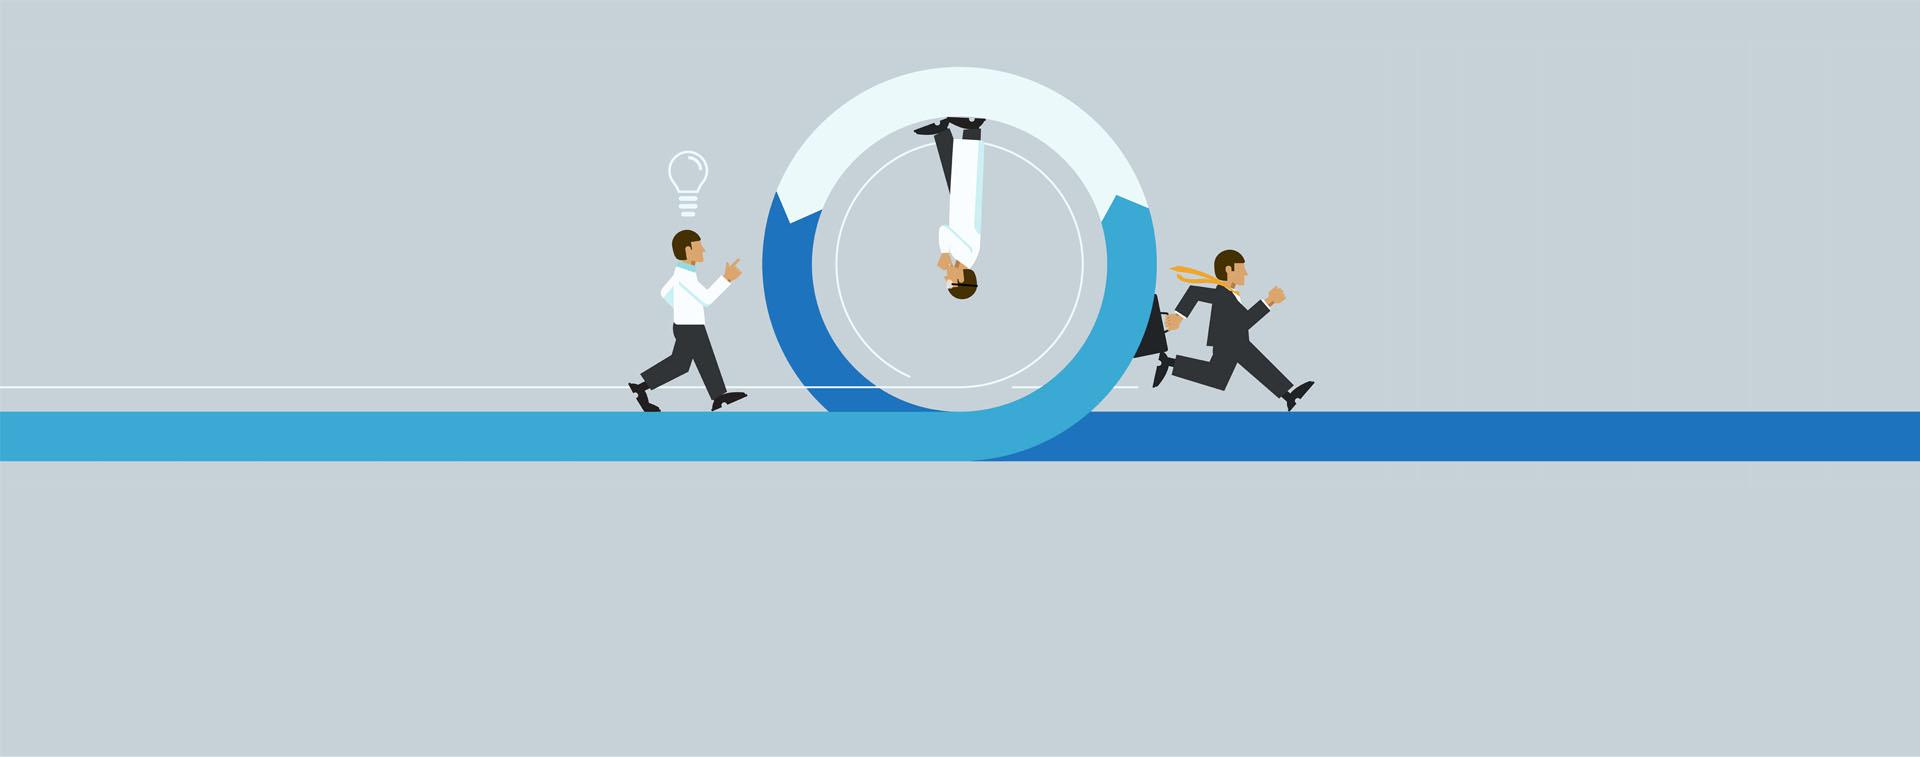 Waarom-agile-teams-geen-training-willen